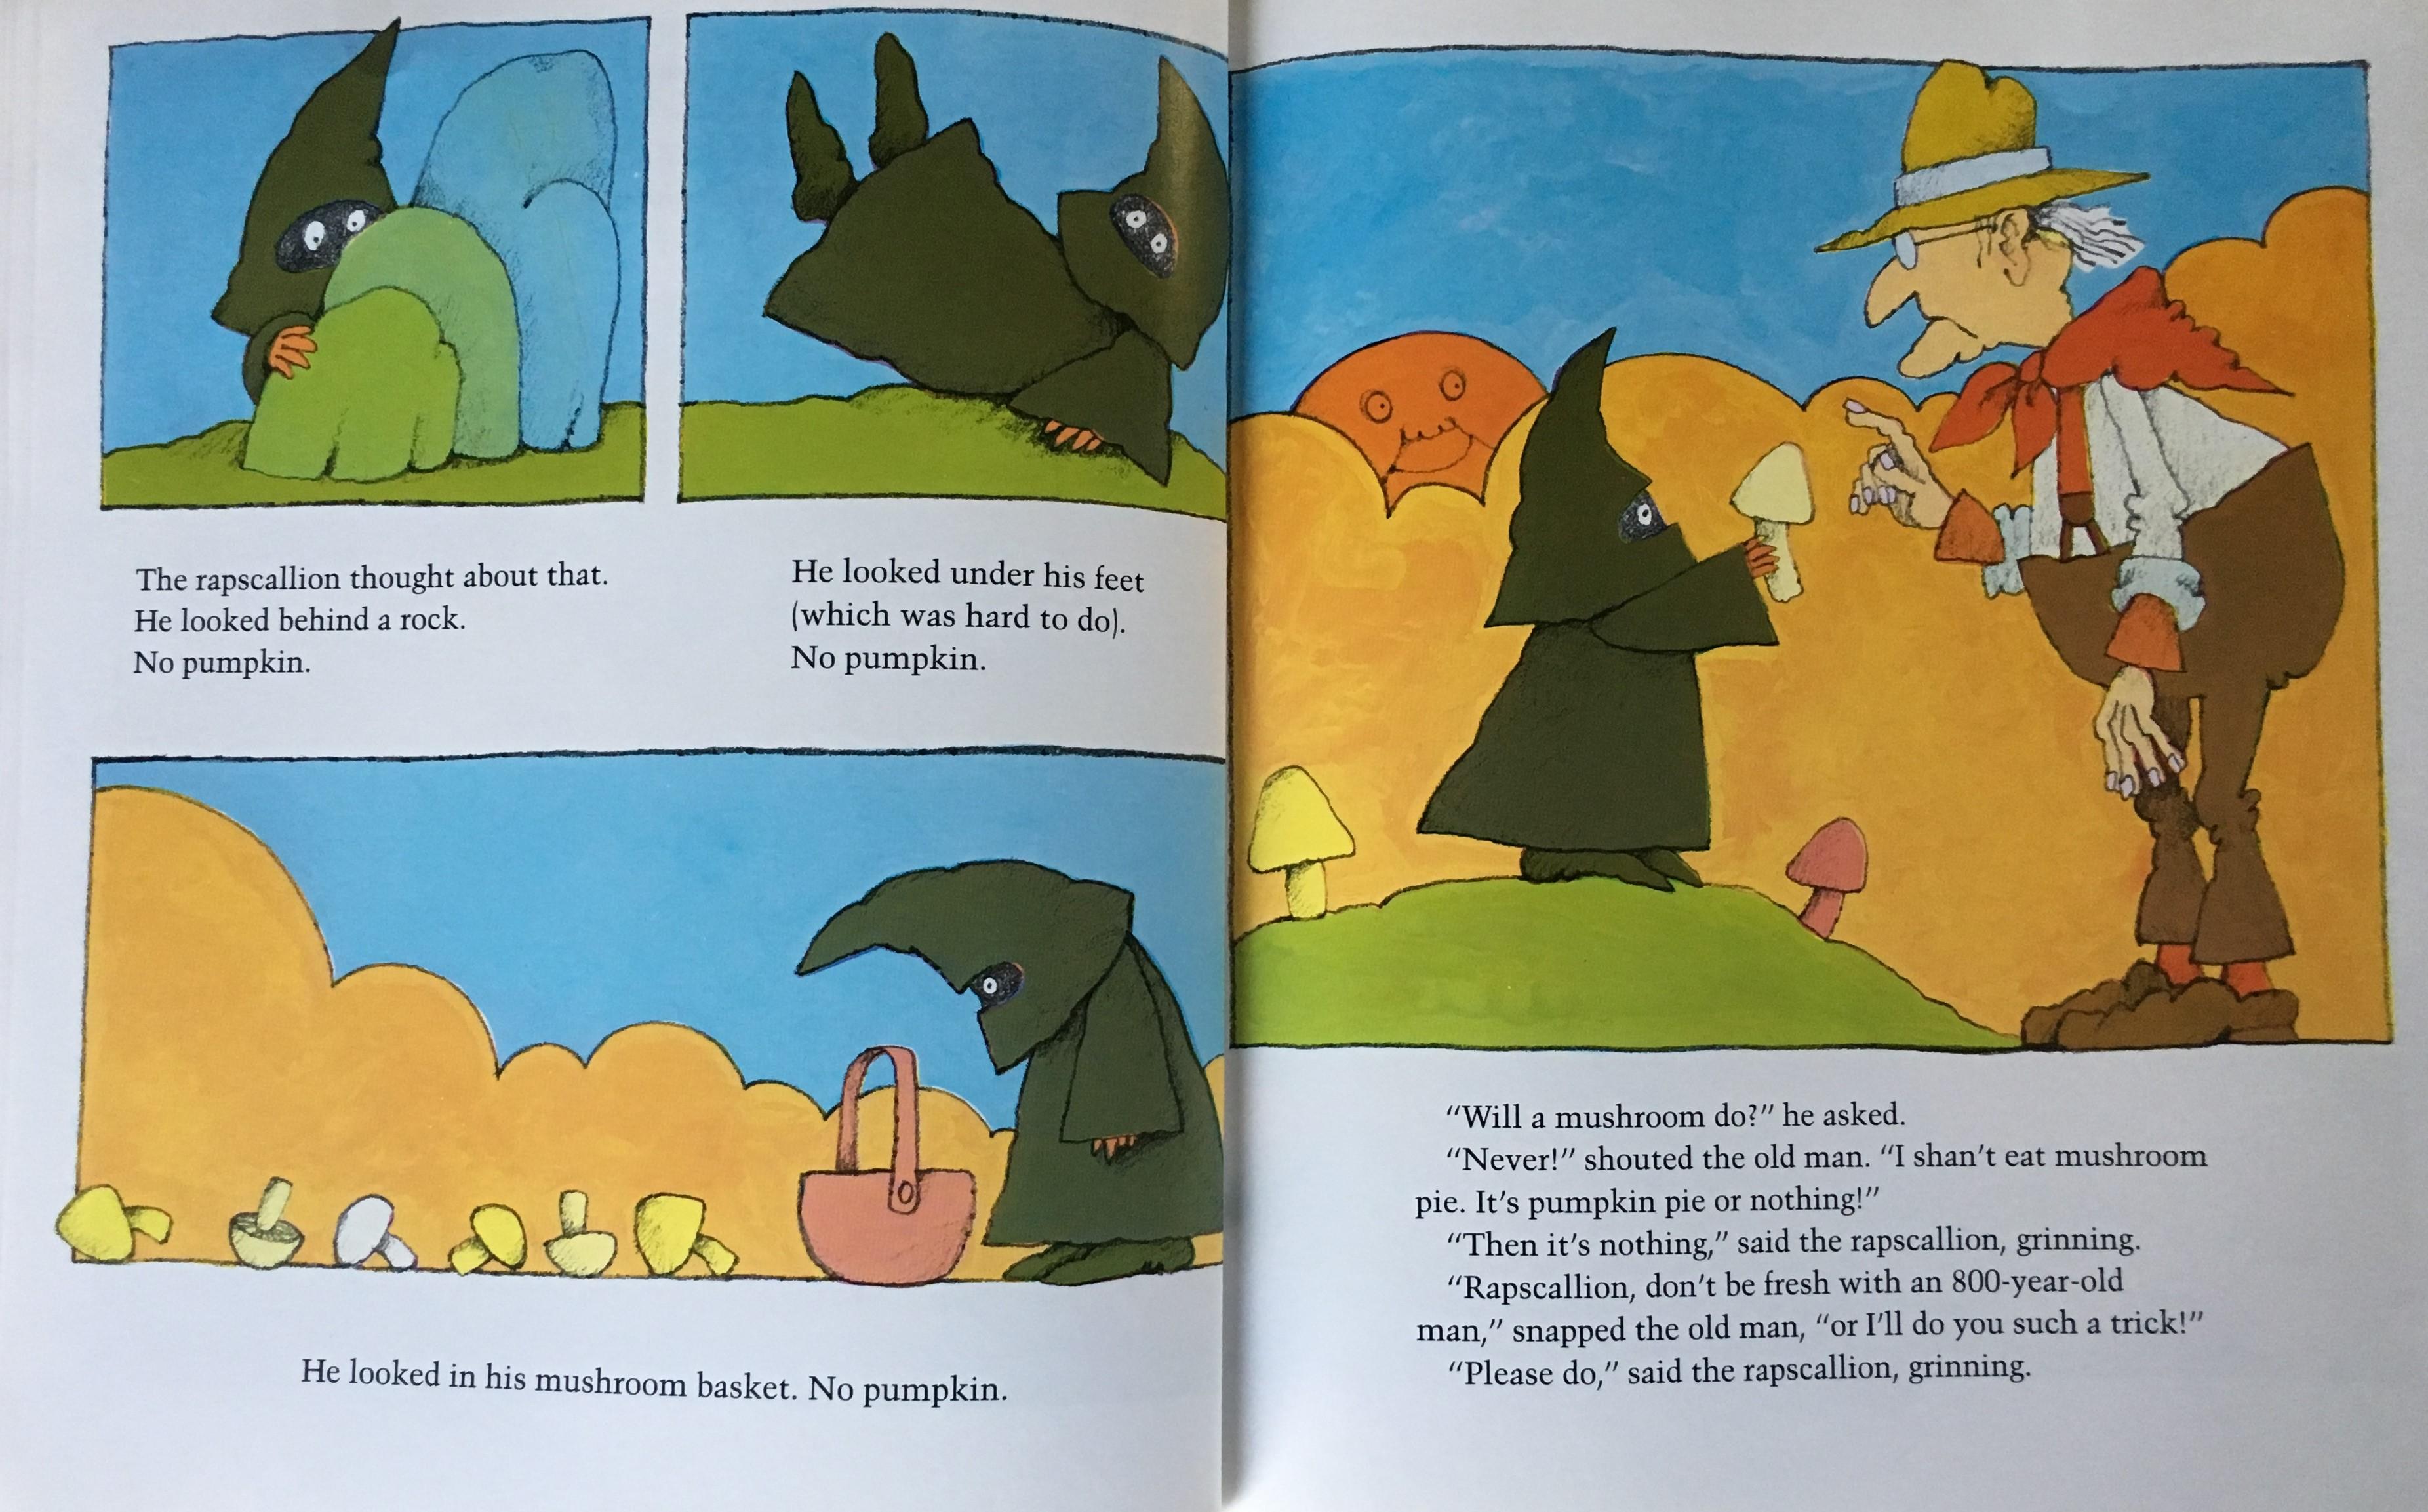 celebrate-picture-books-picture-book-review-the-vanishing-pumpkin-rapscallion